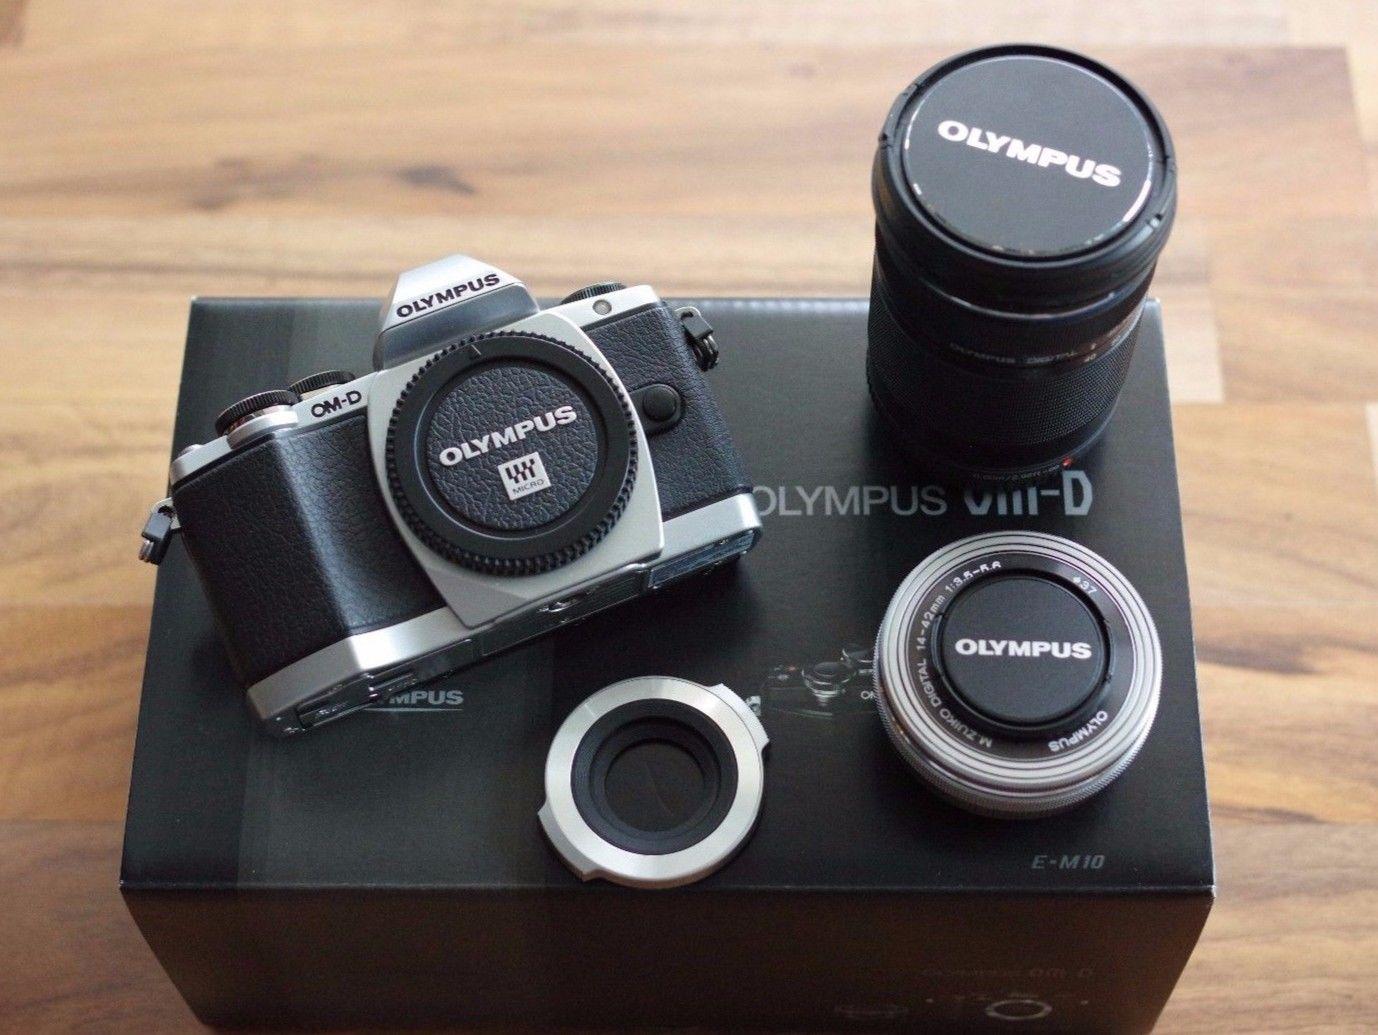 Autoradio Catuo Bildschirm Ausfahrbar 7 High Definition Hd Olympus Om D E M10 Mark Ii Kit 40 150mm Paket 161 Mp Mit Objektiven 14 42mm